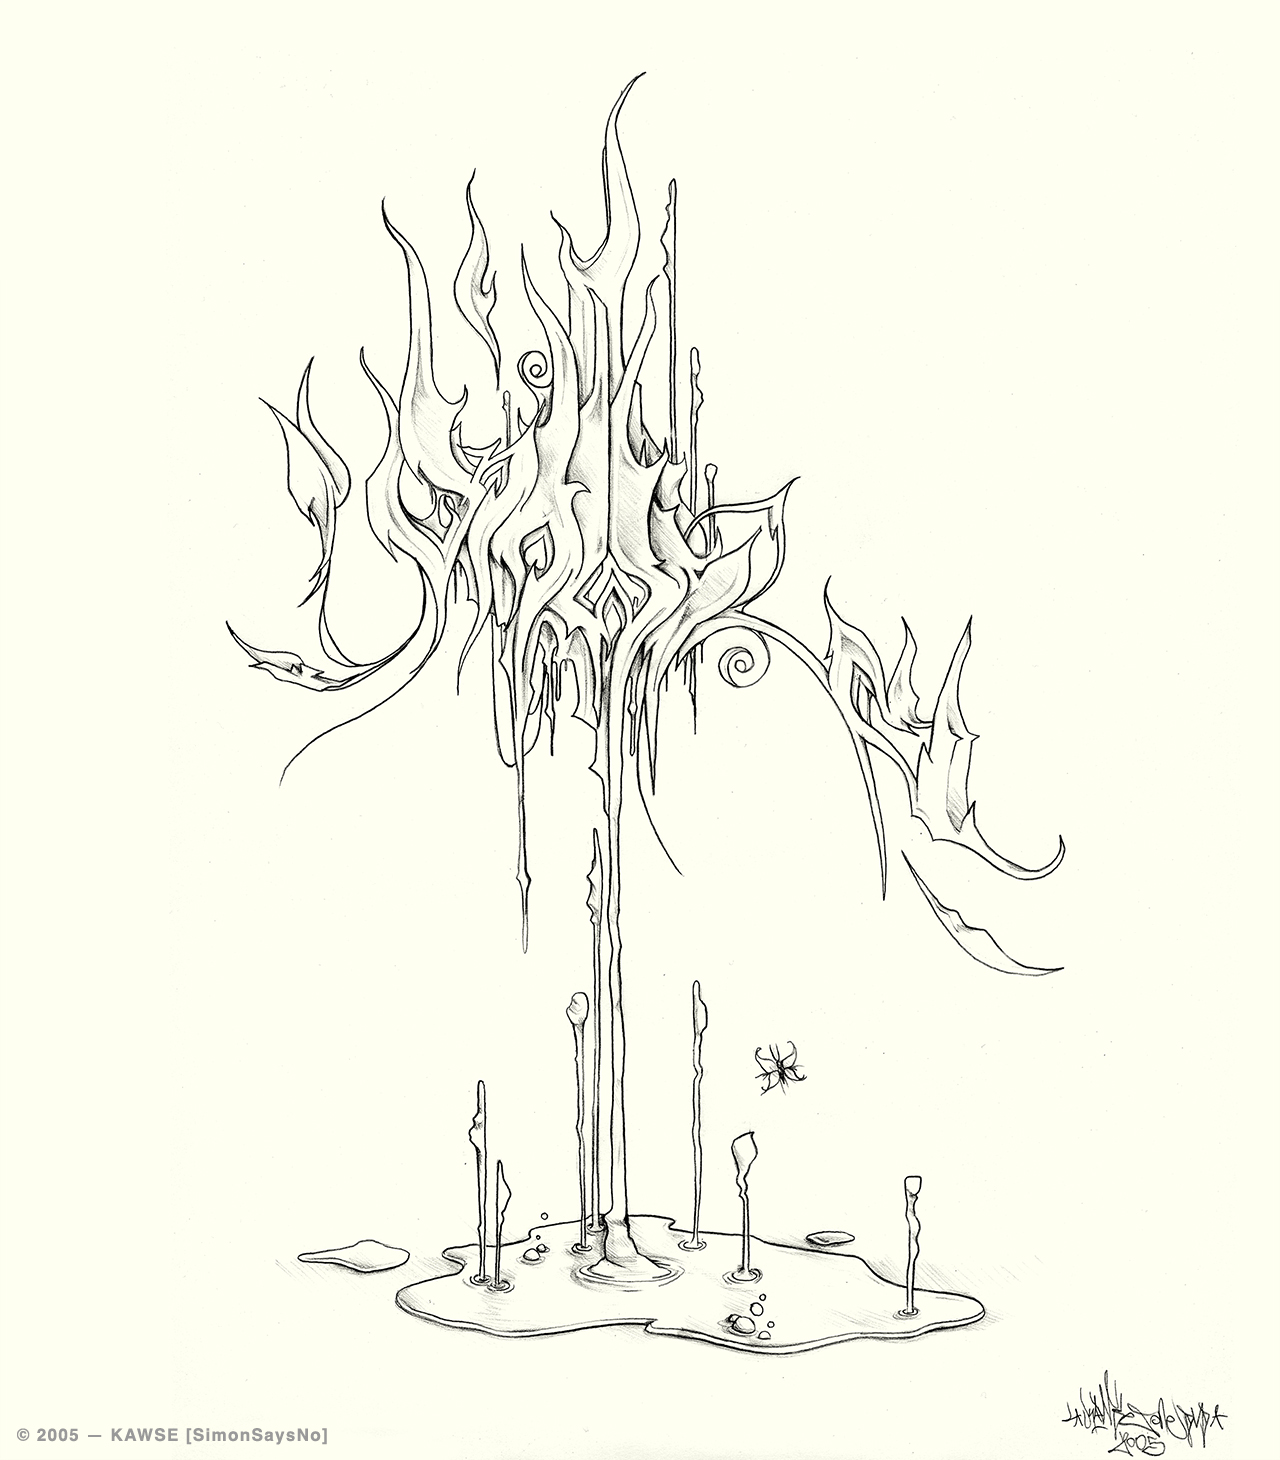 KAWSE 2005 — HIGHER [Sketch]